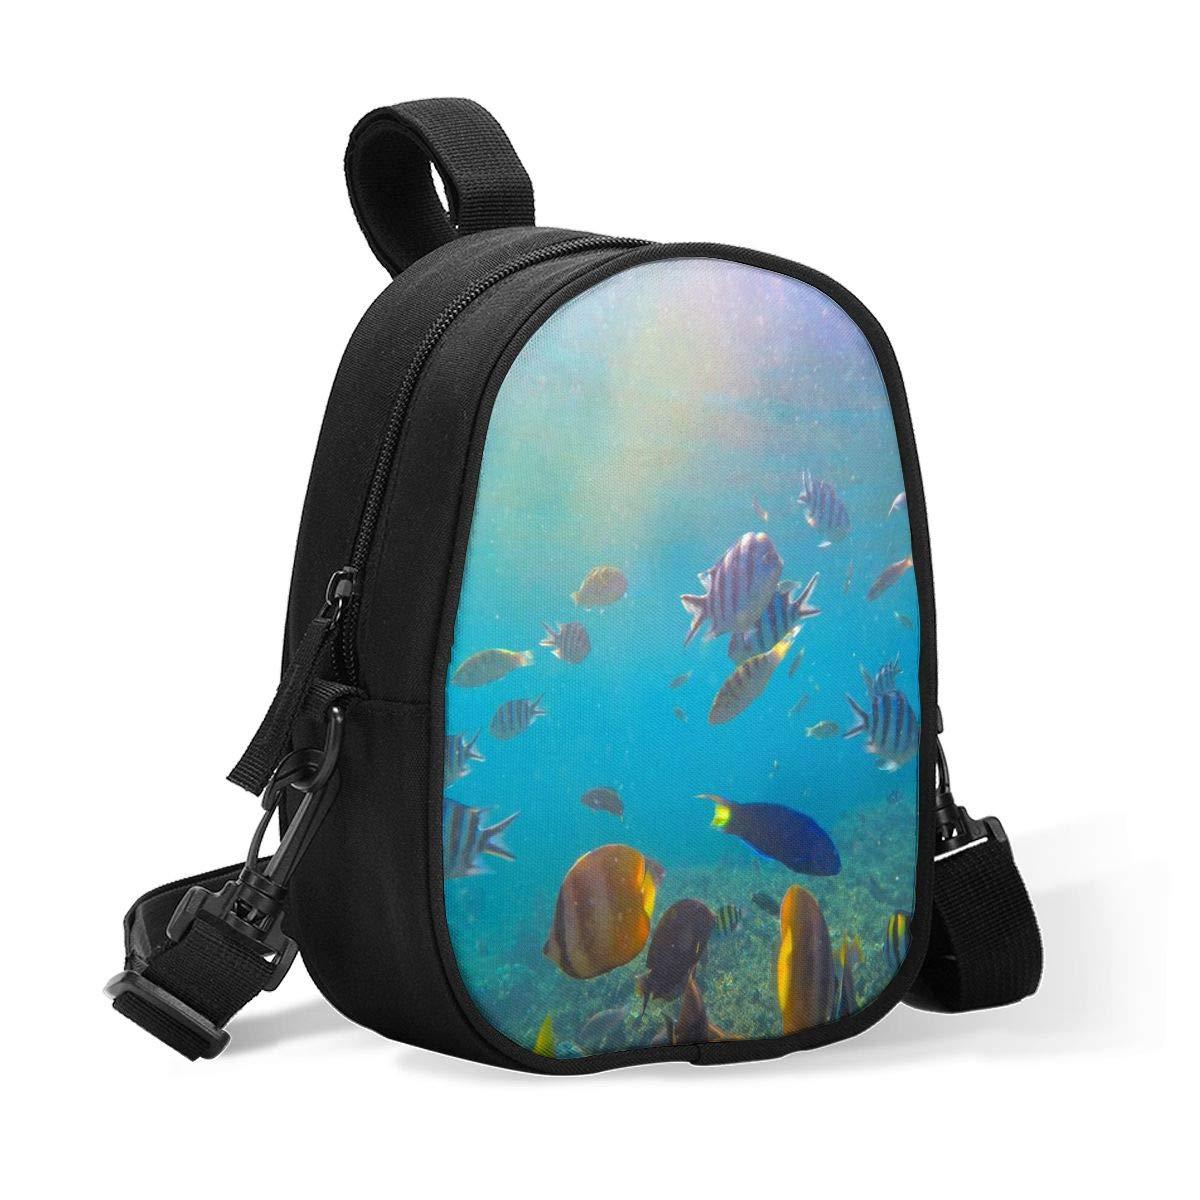 Bottle Cooler Coral,Butterflyfish,Parrotfish Underwater Breastmilk Cooler,Insulated Breast Milk Cooler Baby Bottle Bag W/Adjustable Strap Stroller Fits 2 Large Bottles,Lunch Box Tote Storage Bag